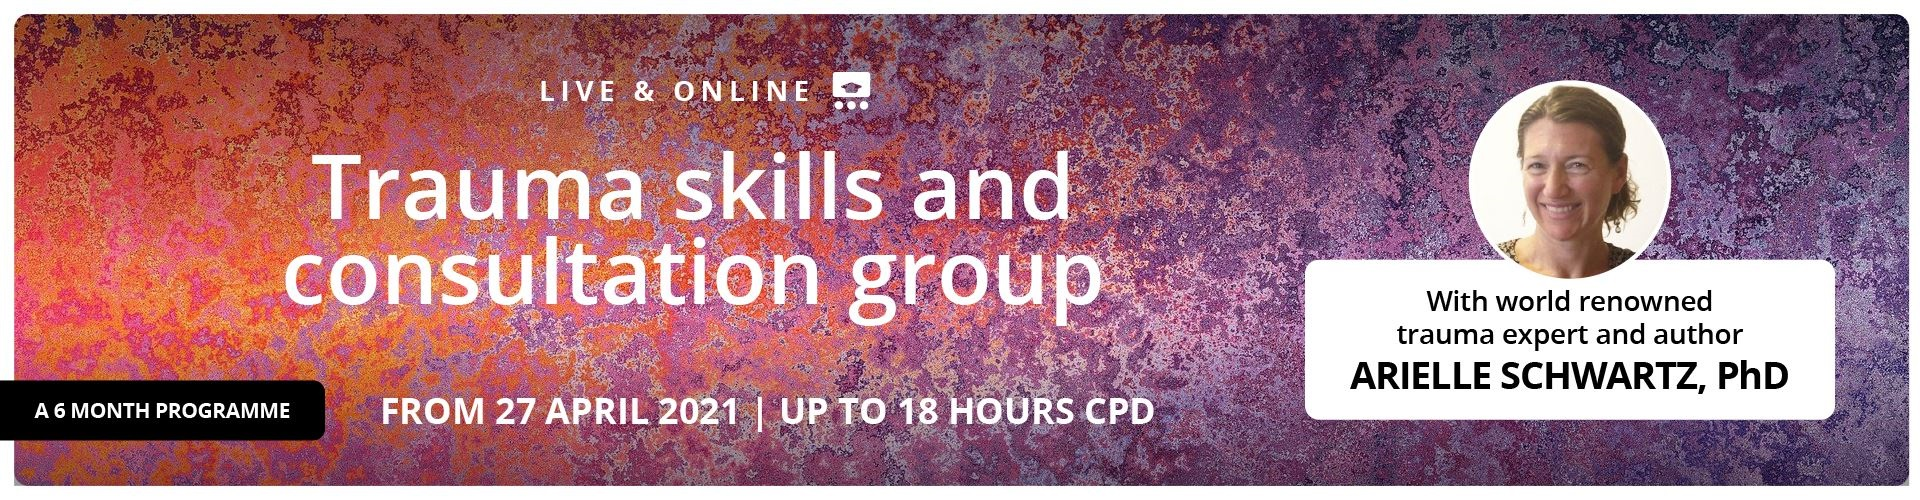 Trauma skills and Consultation group